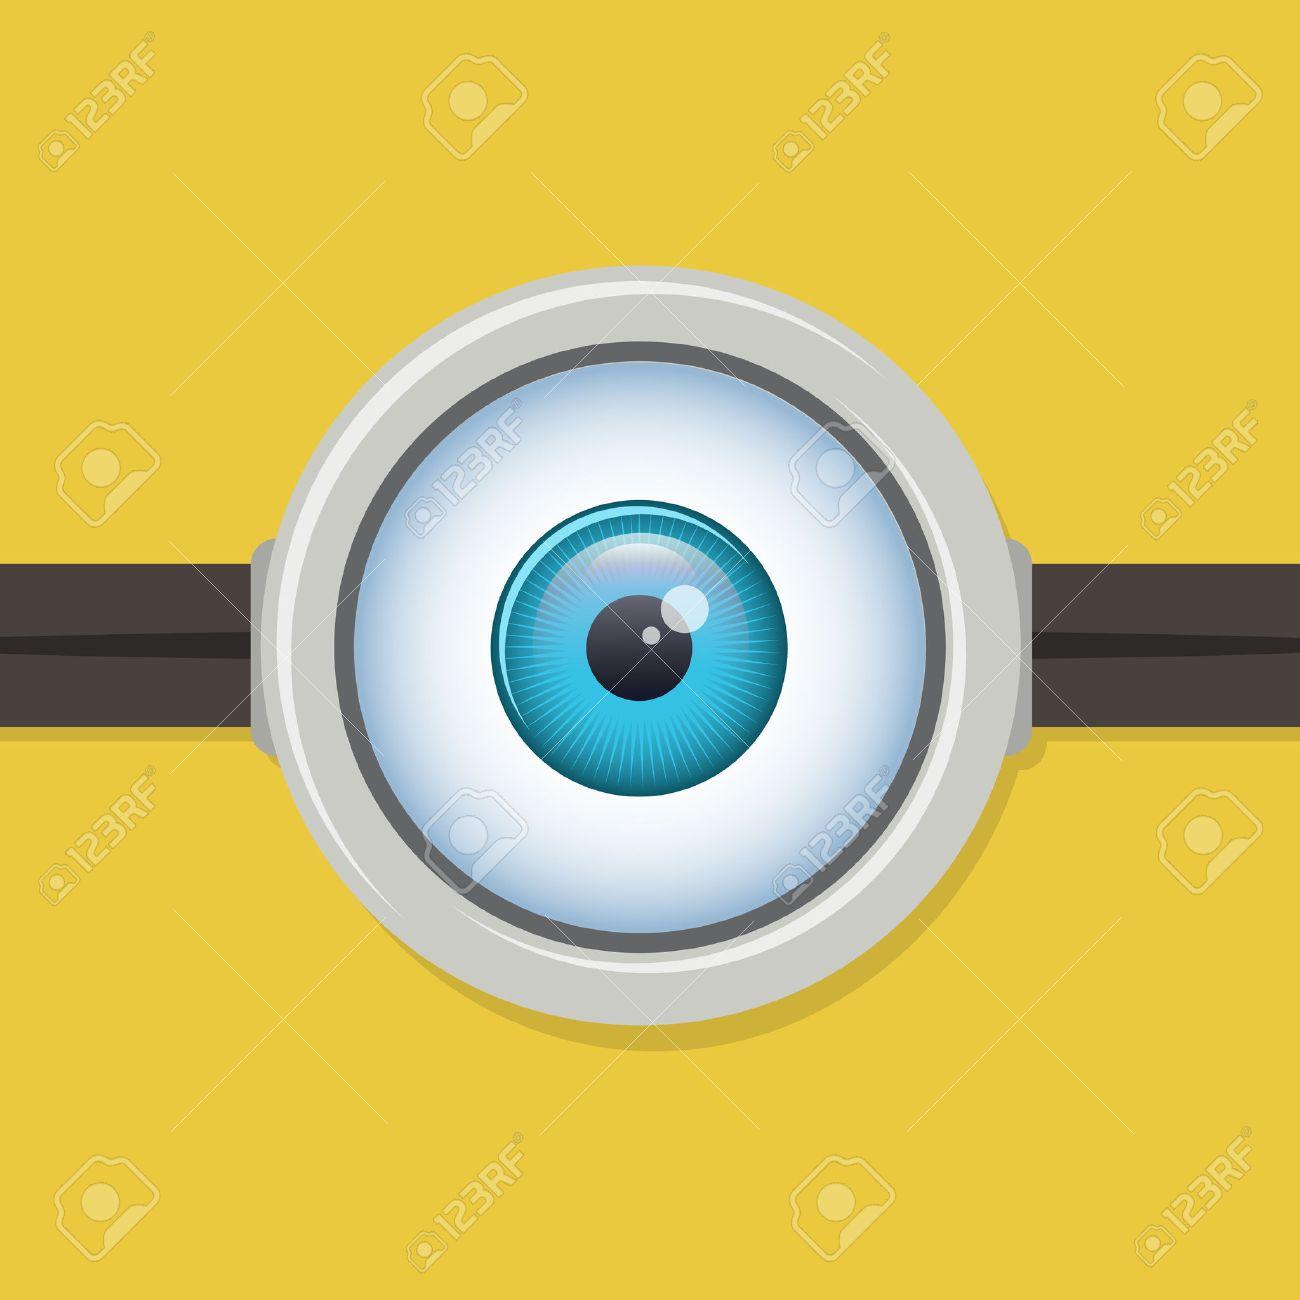 One Eye Glasses Or Goggles Minion Yellow Closeup Lens Eyeball